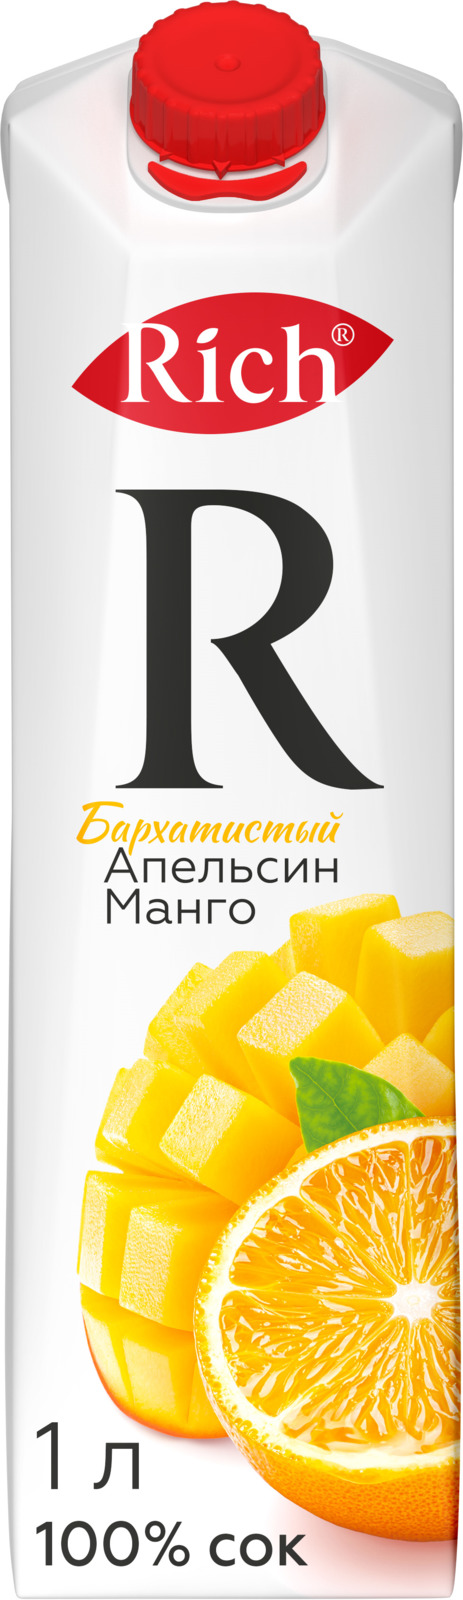 Richнектар Апельсин-Манго, 1 л Rich